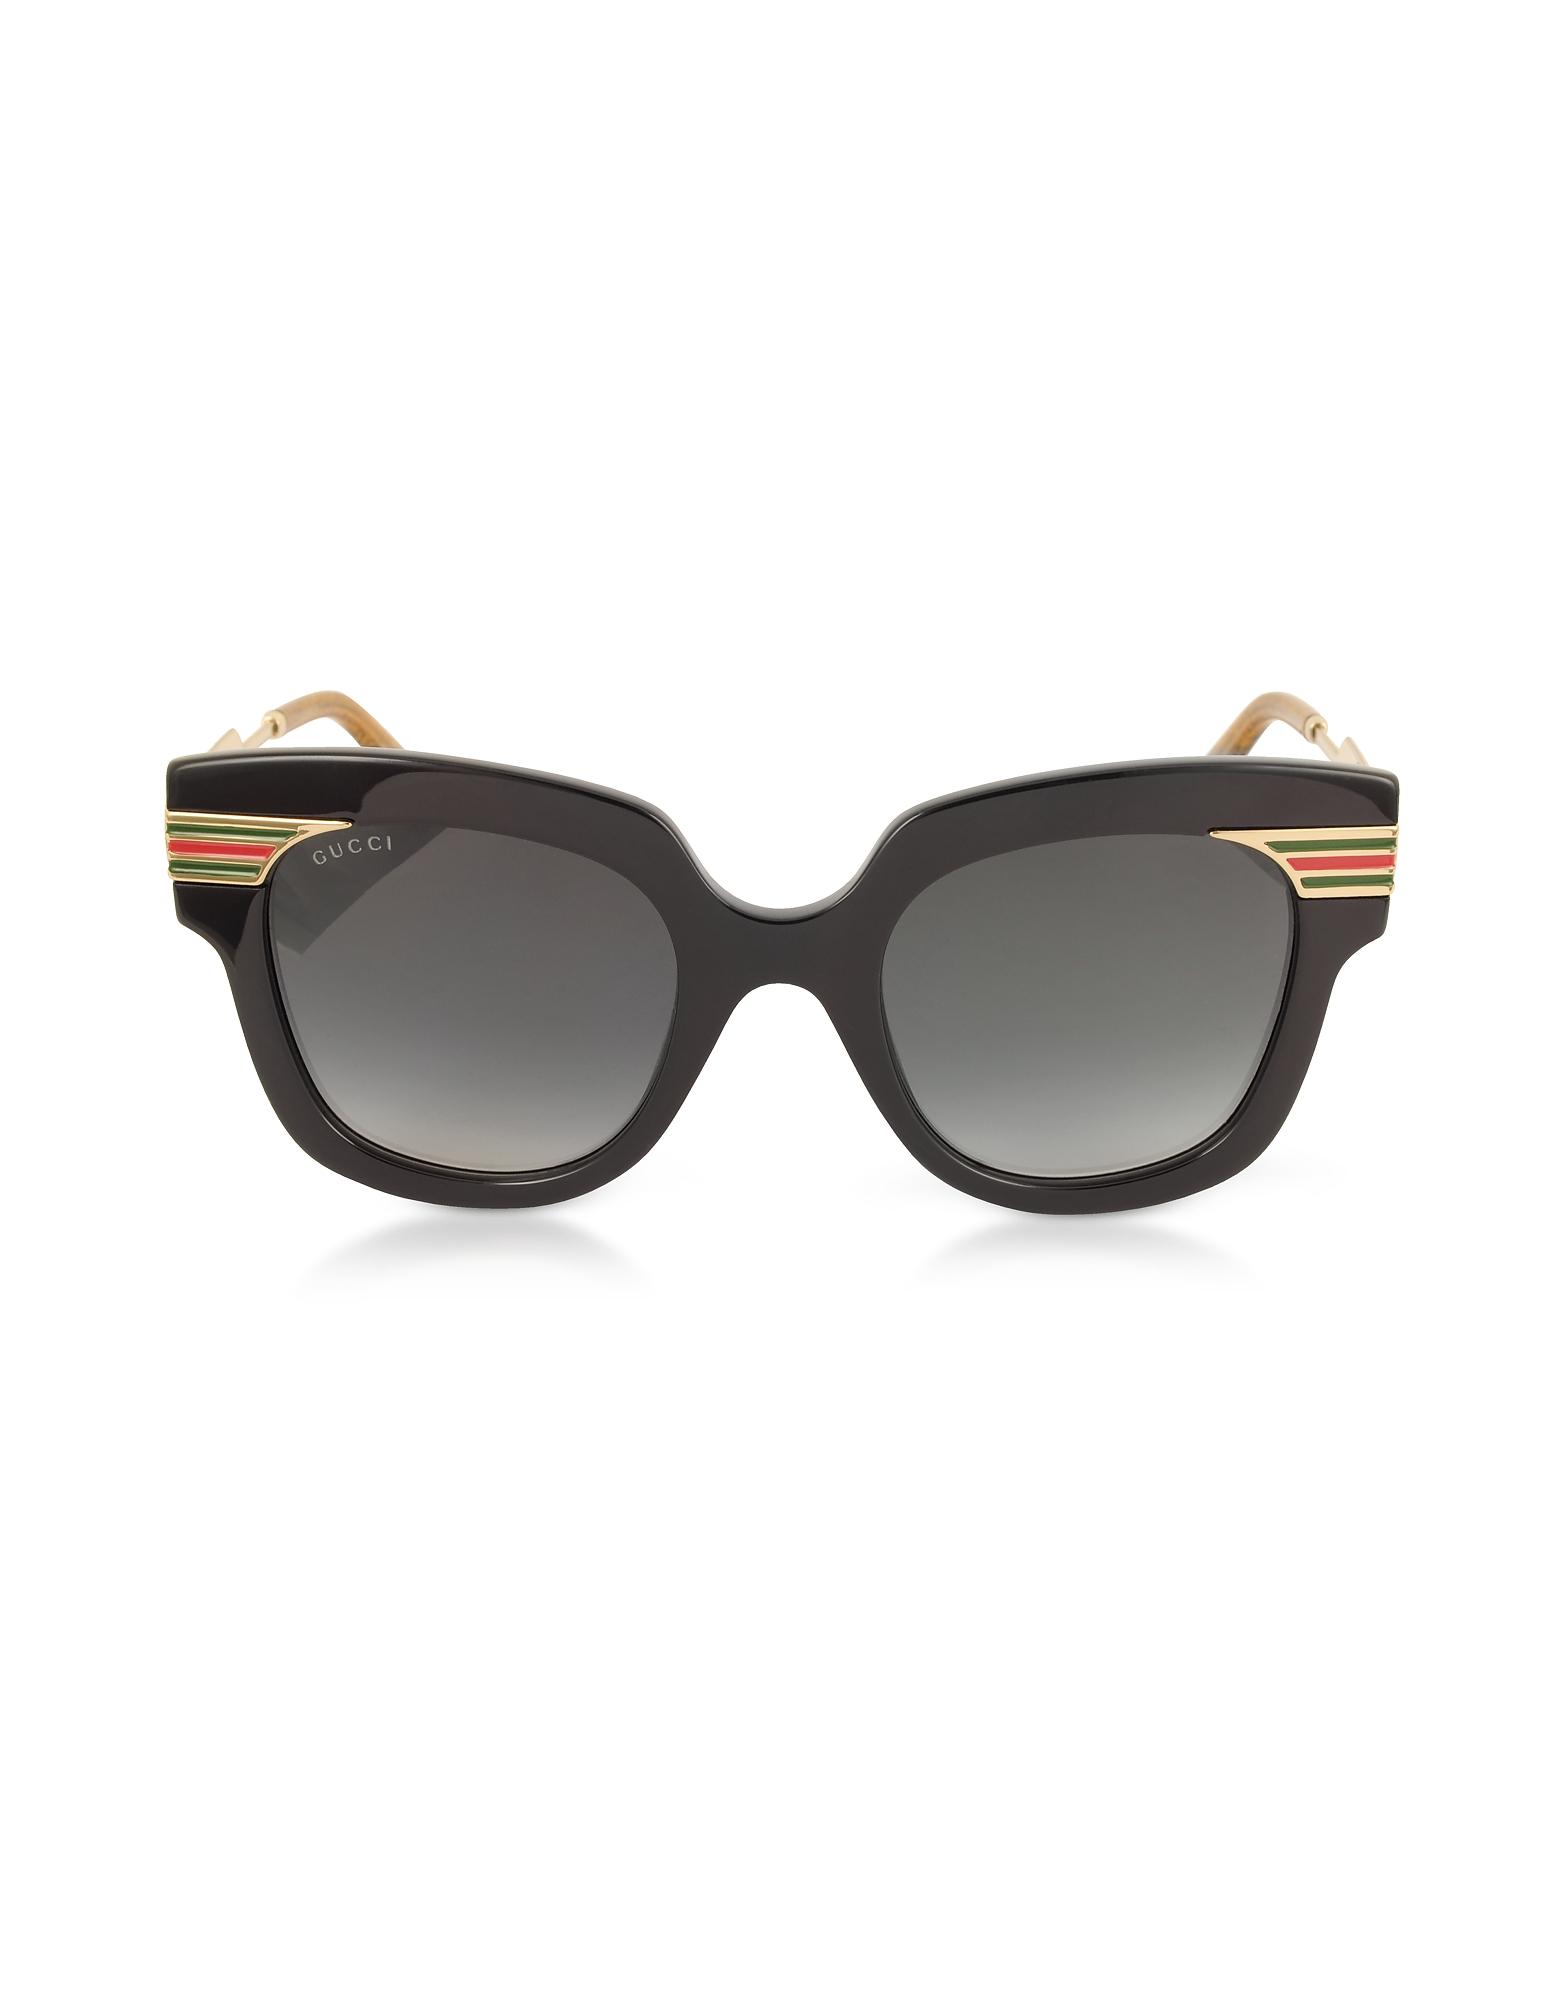 Gucci Designer Sunglasses, GG0281S Square-Frame Black Acetate Sunglasses w/Sylvie Web Temples